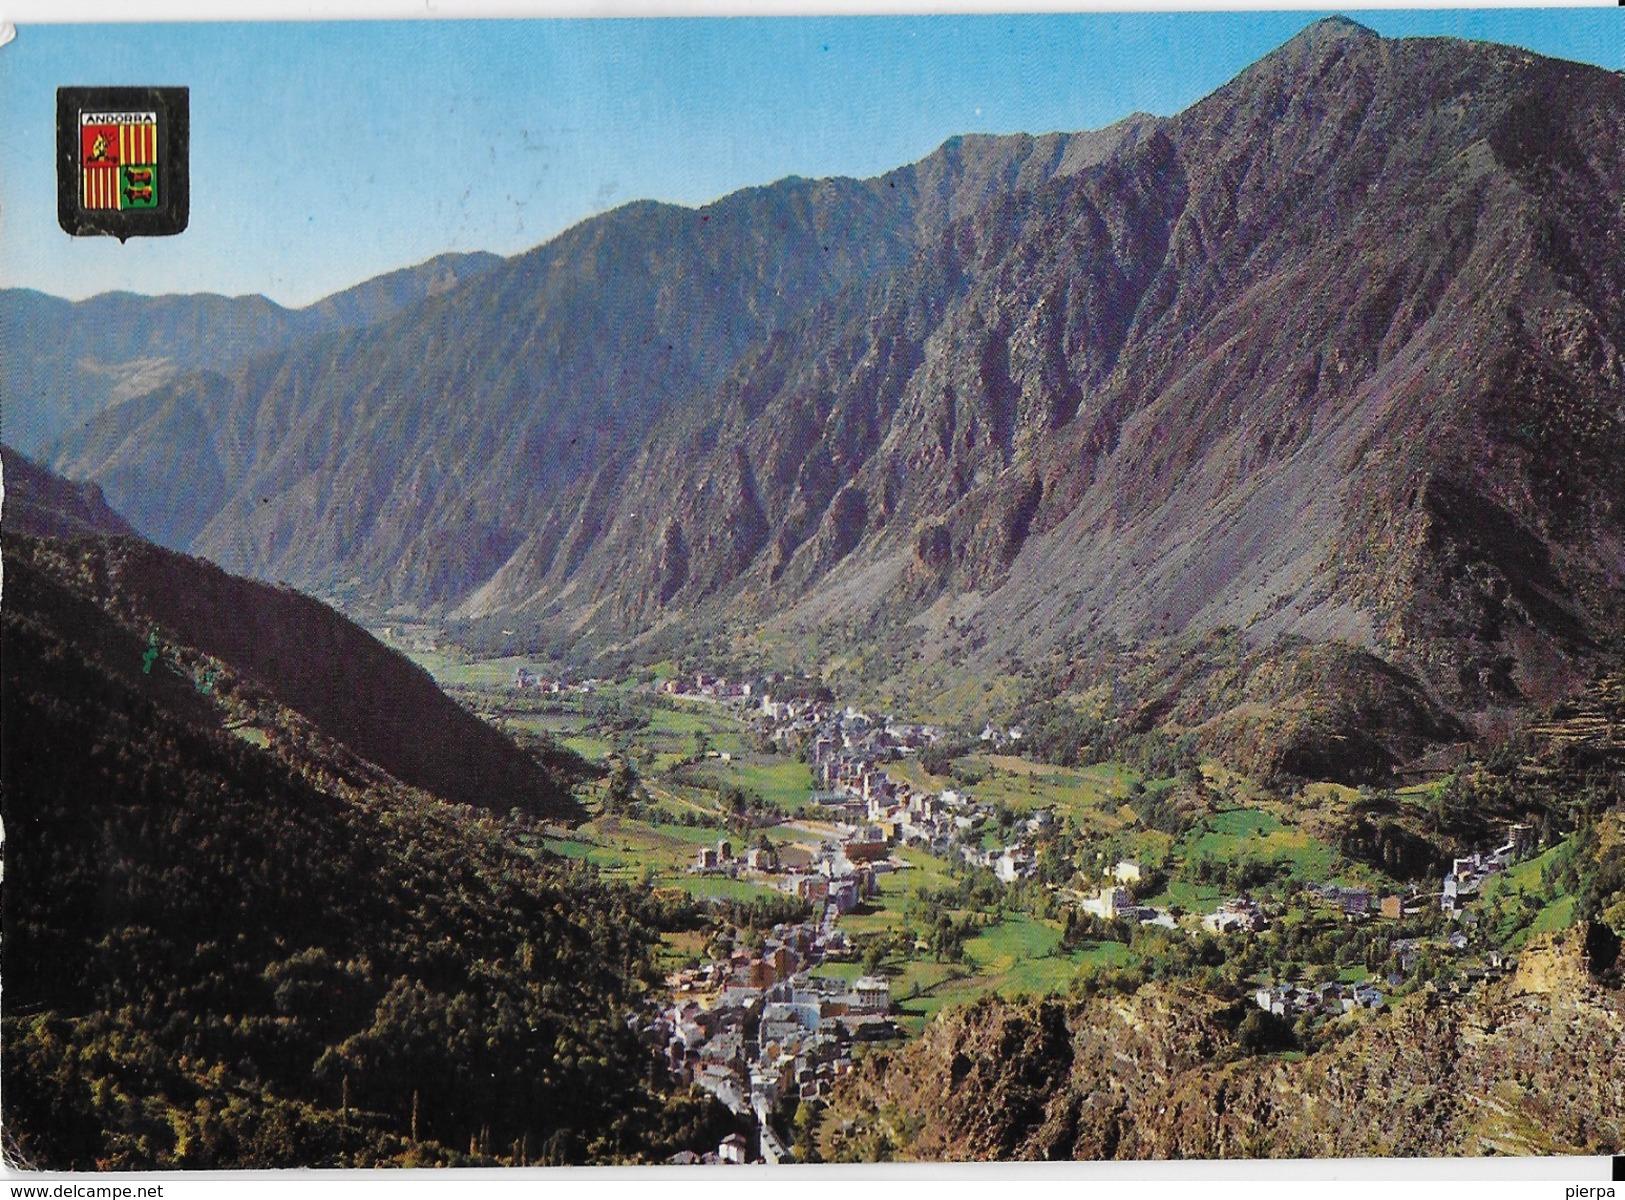 ANDORRA - PANORAMA - VIAGGIATA 1972 FRANCOBOLLO ASPORTATO - Andorra